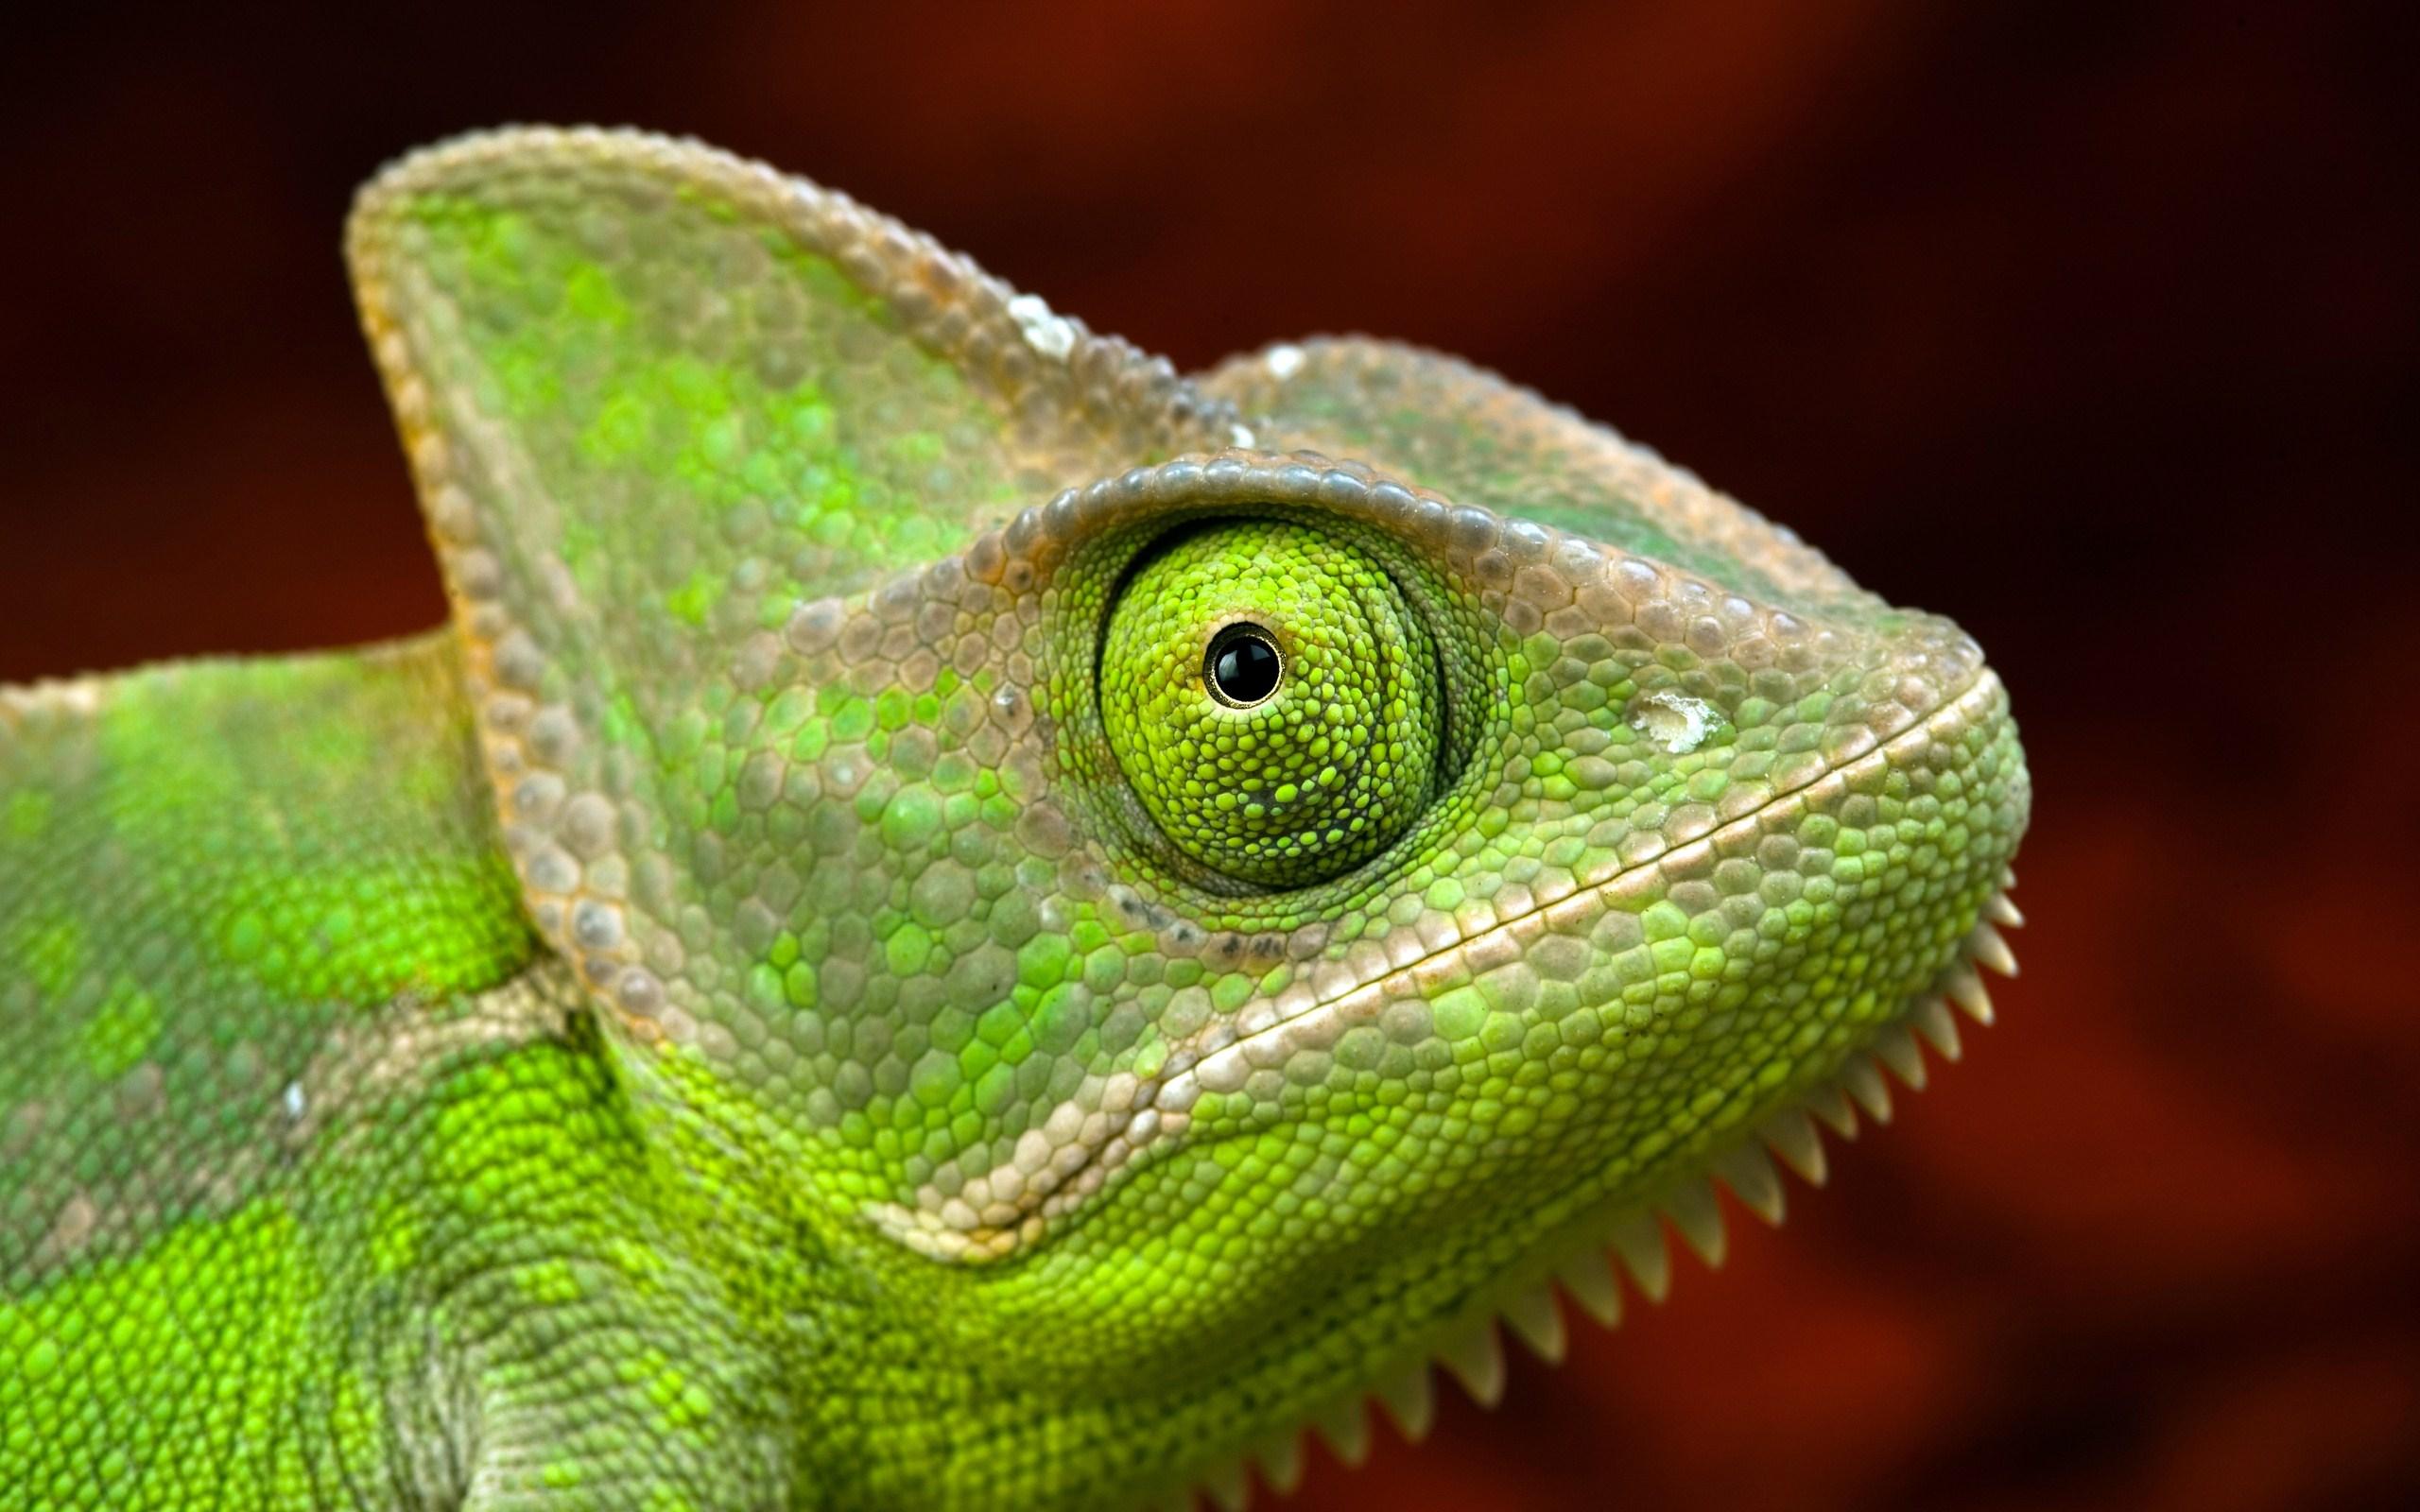 green chameleon side photo close up eye